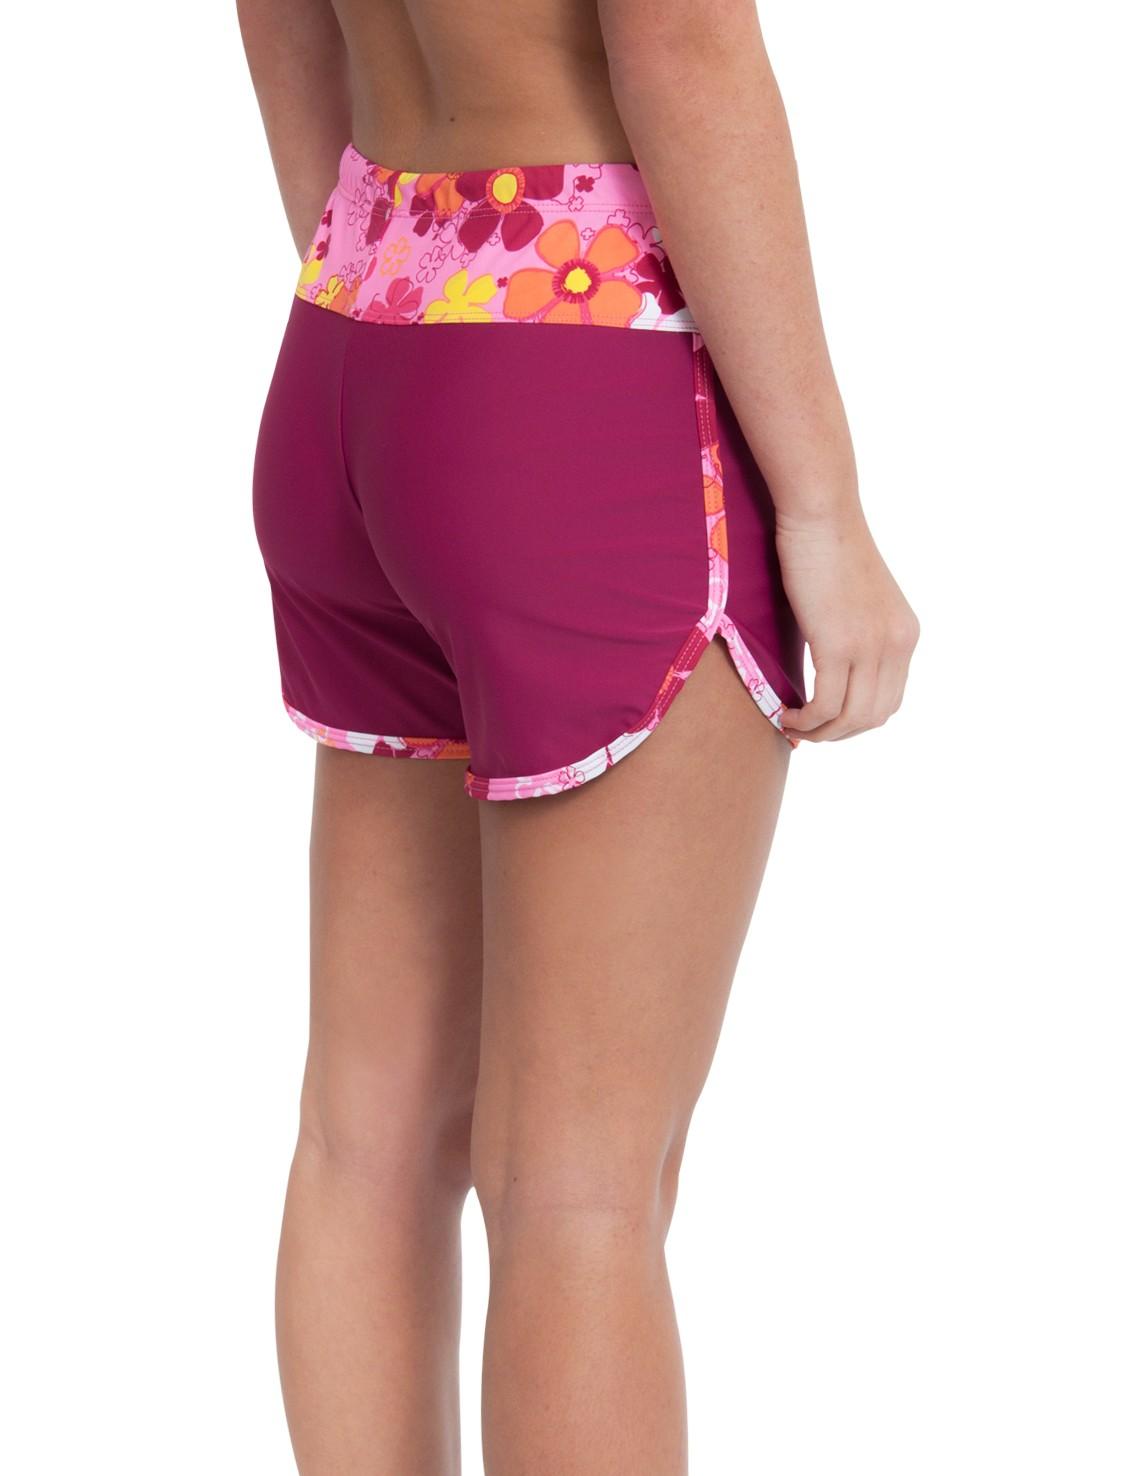 womens swim shorts womenu0027s swim shorts - daisy pink BSWZLVC